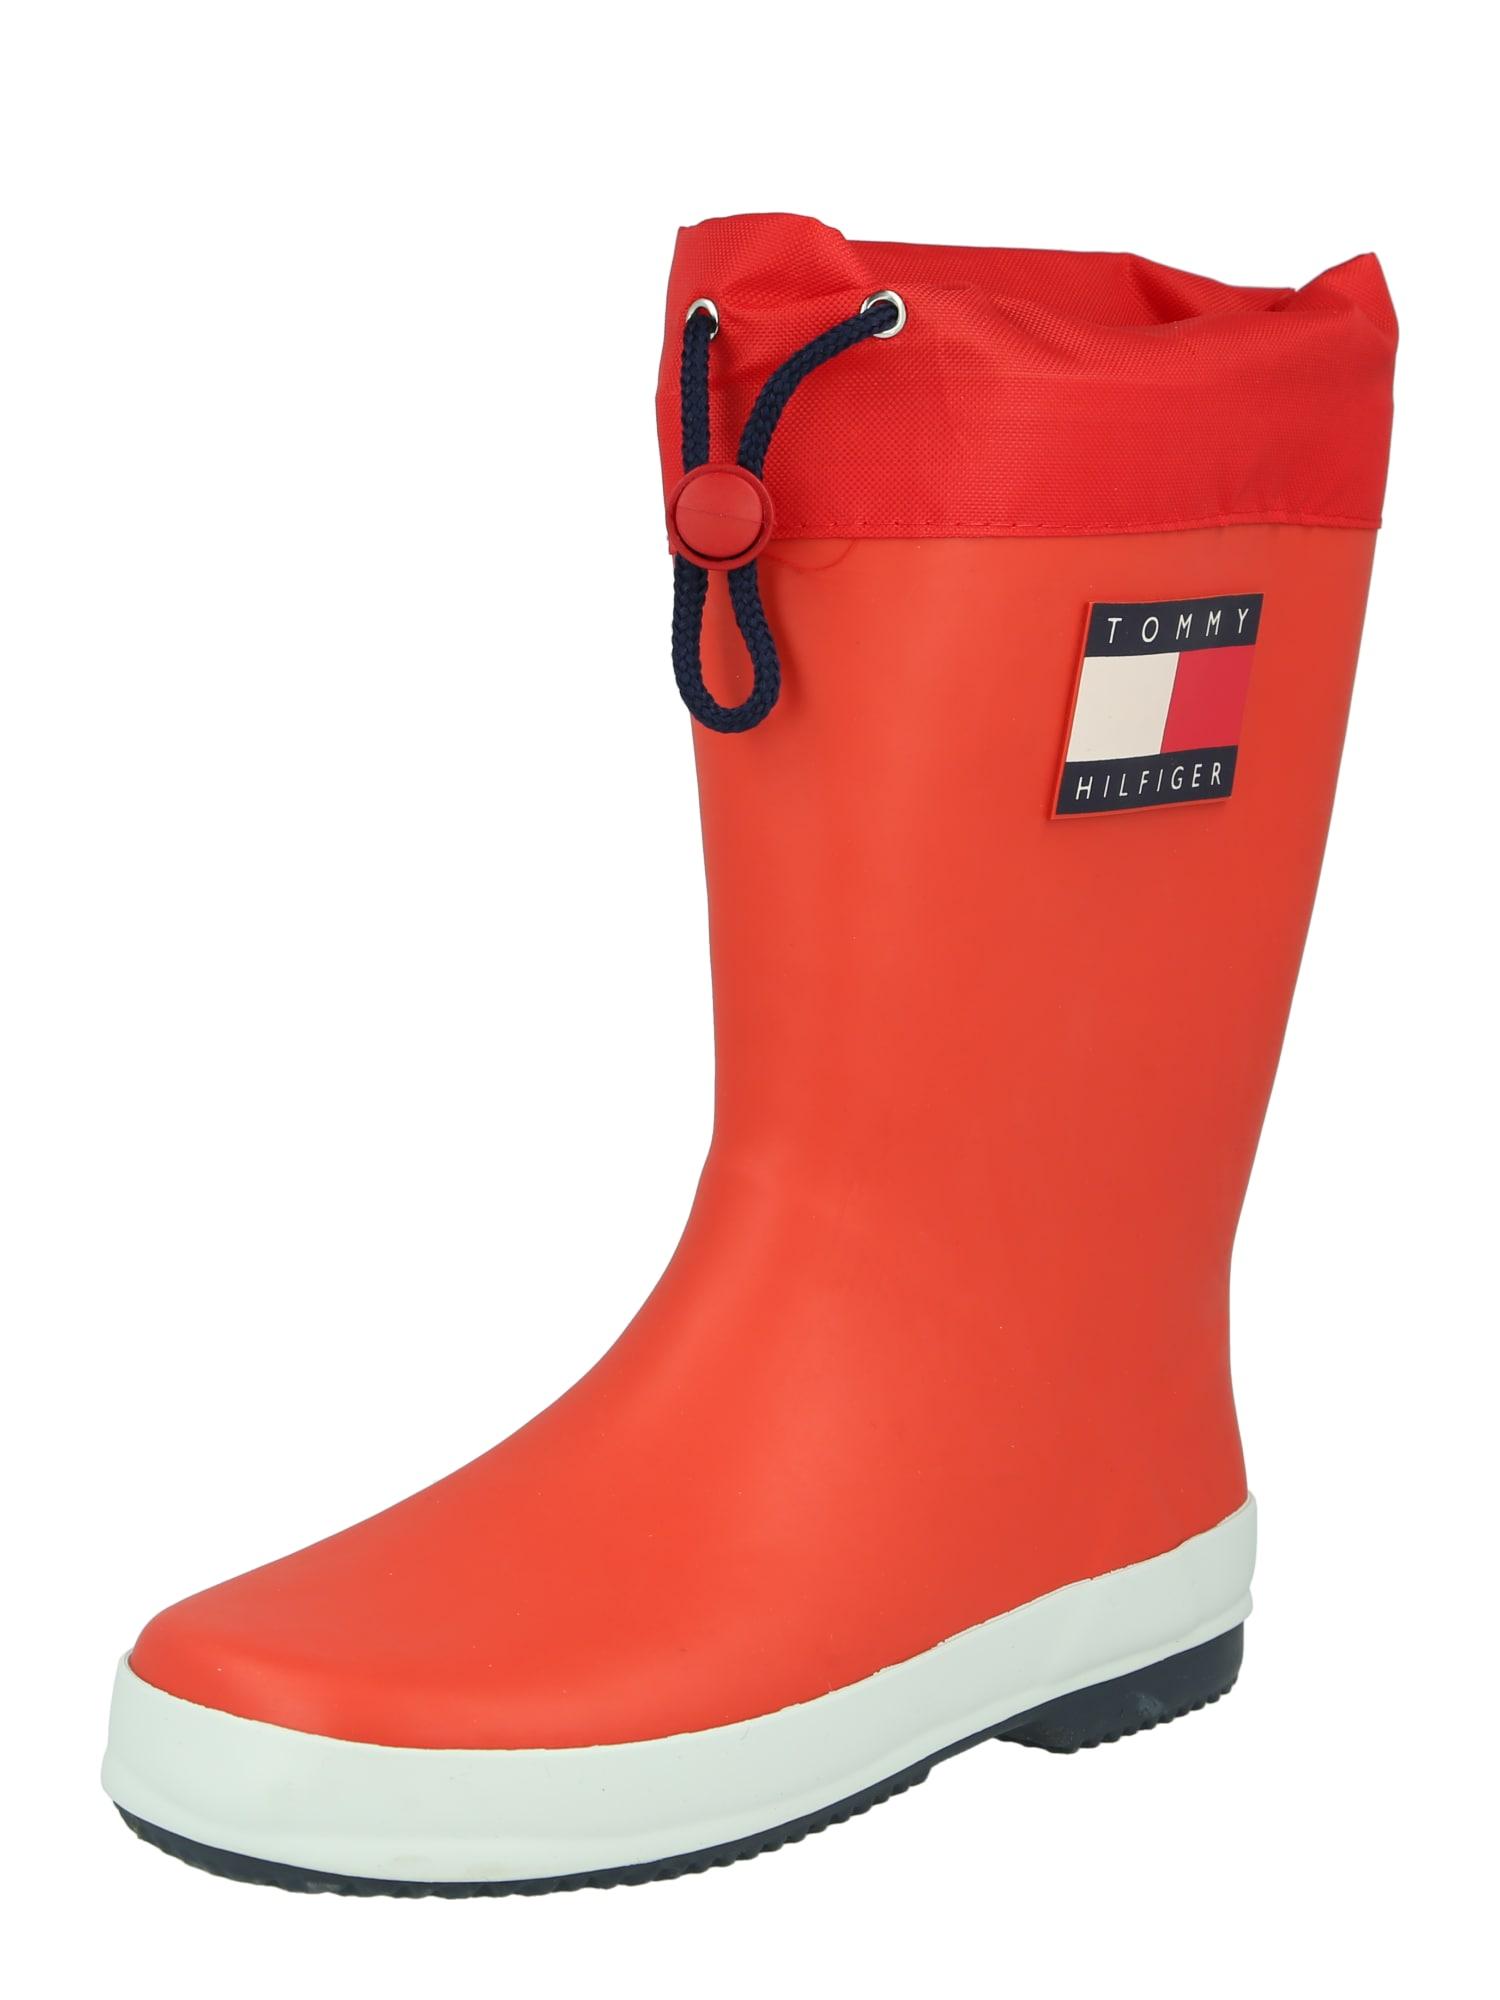 TOMMY HILFIGER Guminiai batai raudona